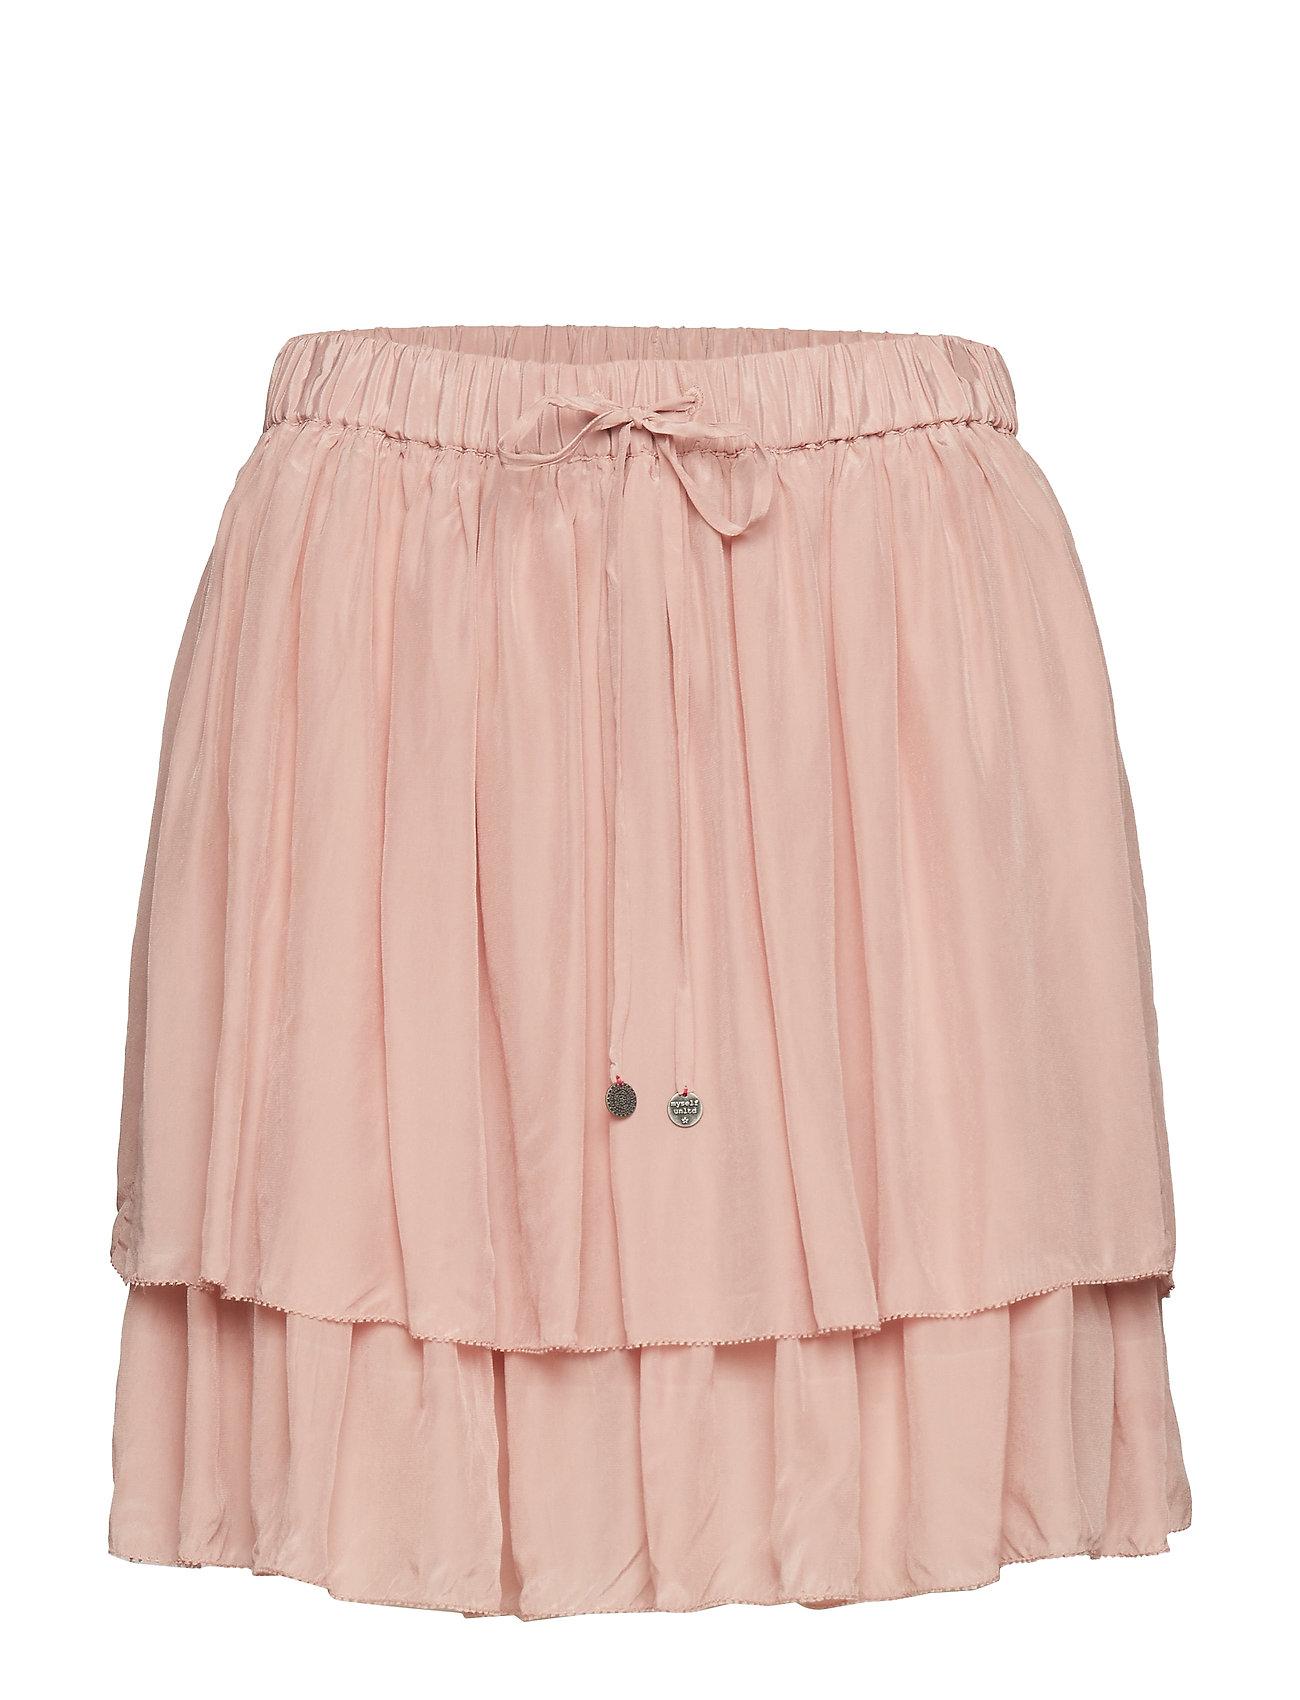 ODD MOLLY i-escape skirt - POWDER